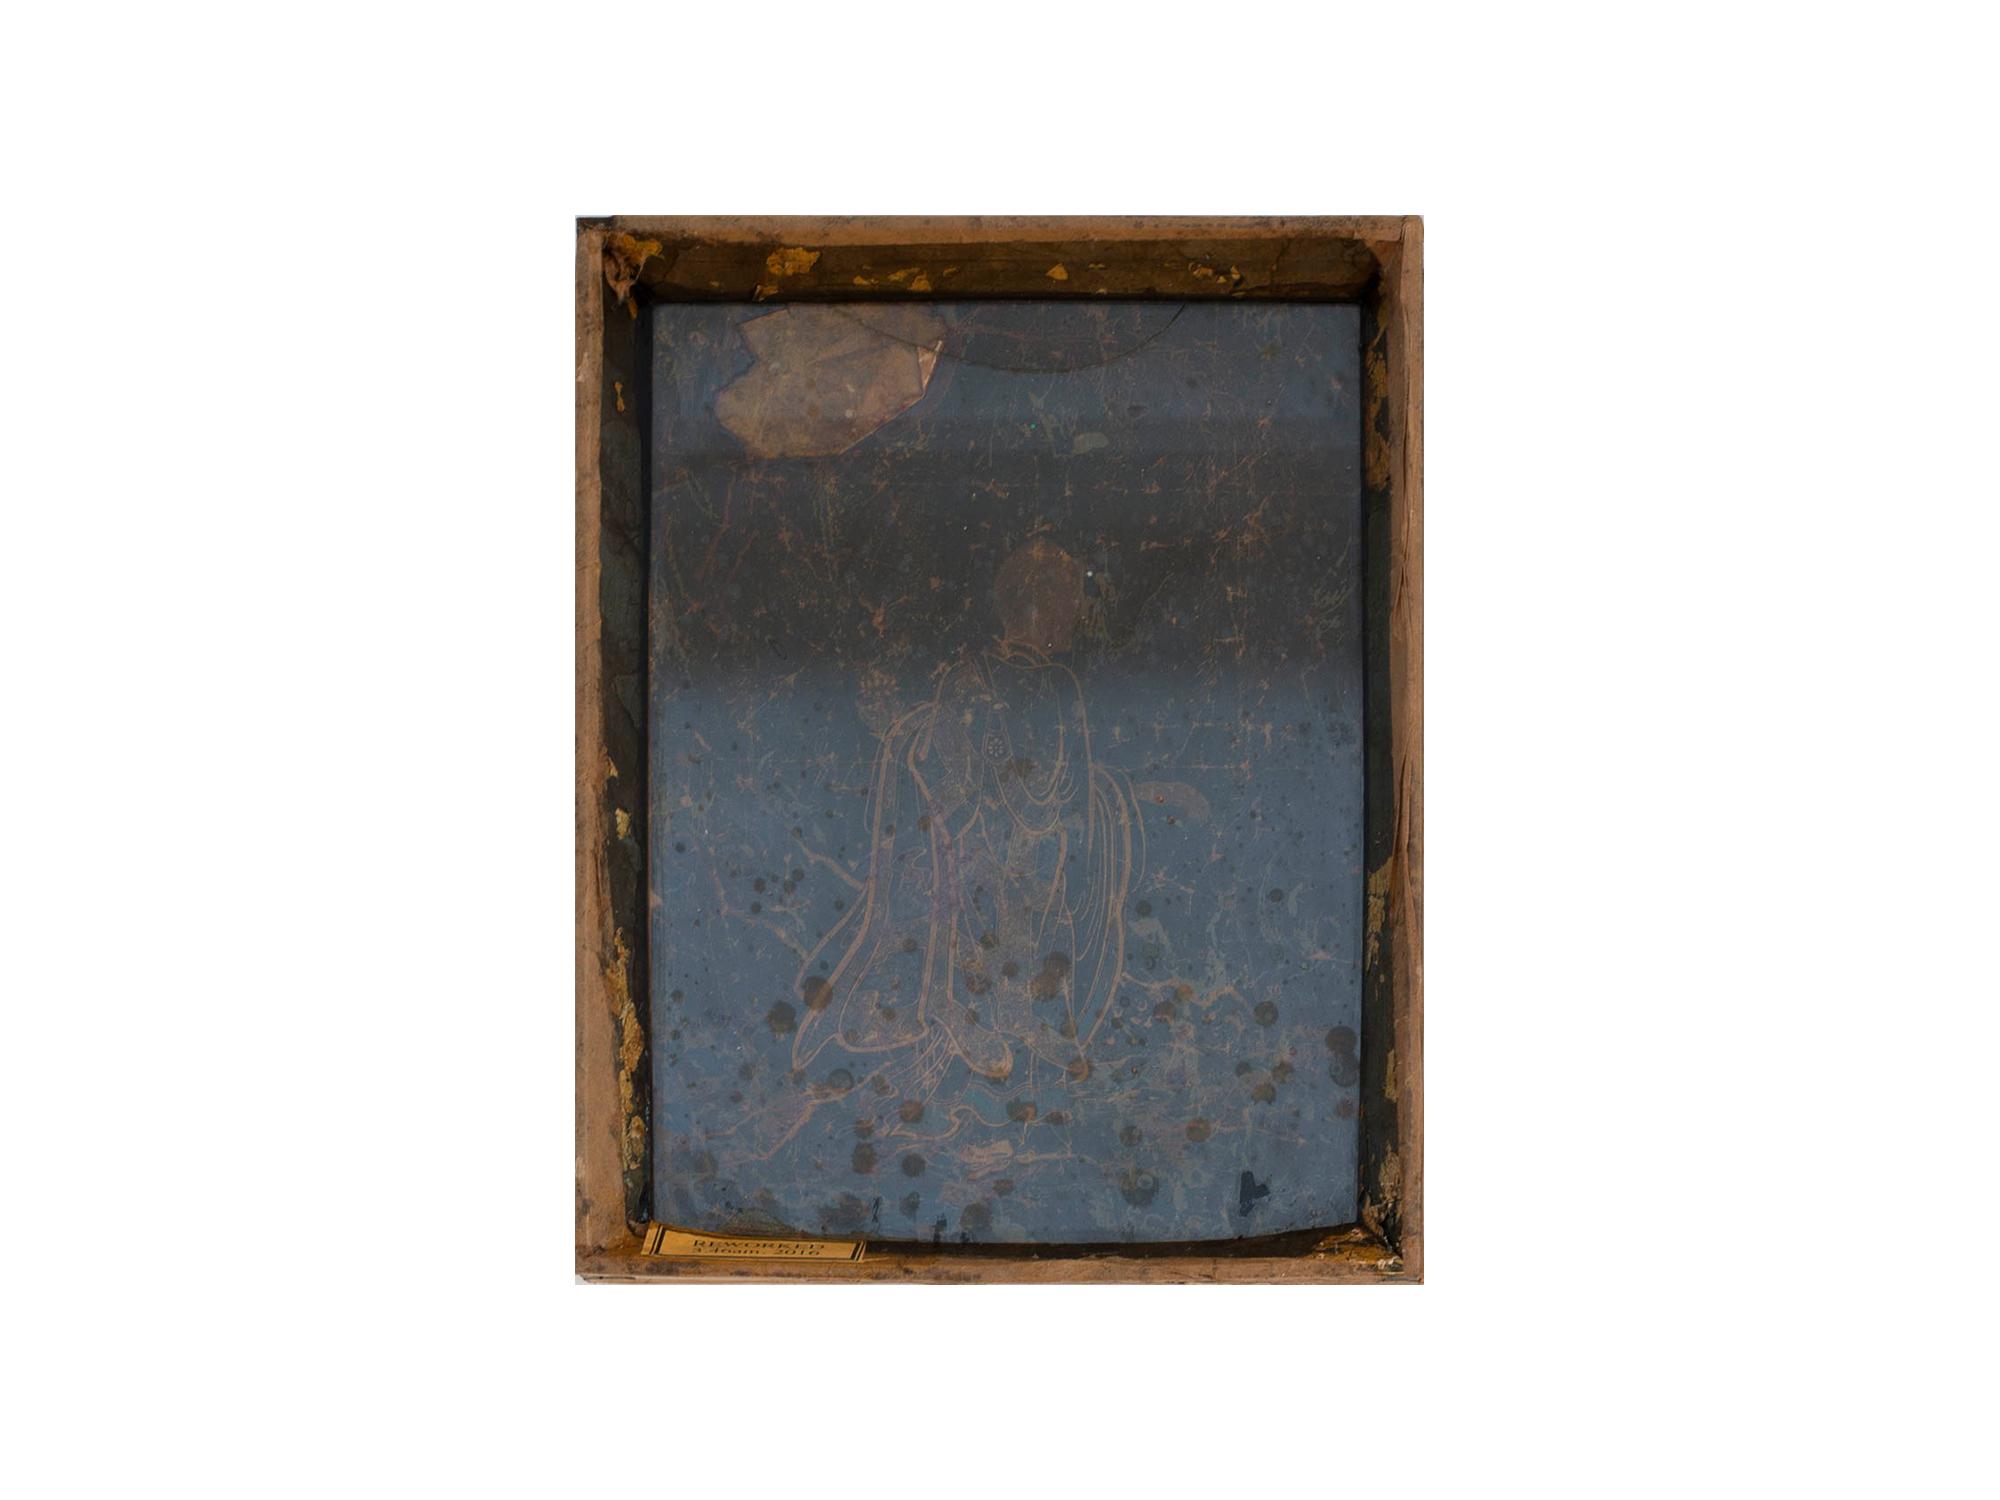 Bernard Sachs   Untitled (Weltsinneslust) , 2016 mixed media on metal framed print 25.5 x 21cm   ARTIST BIO